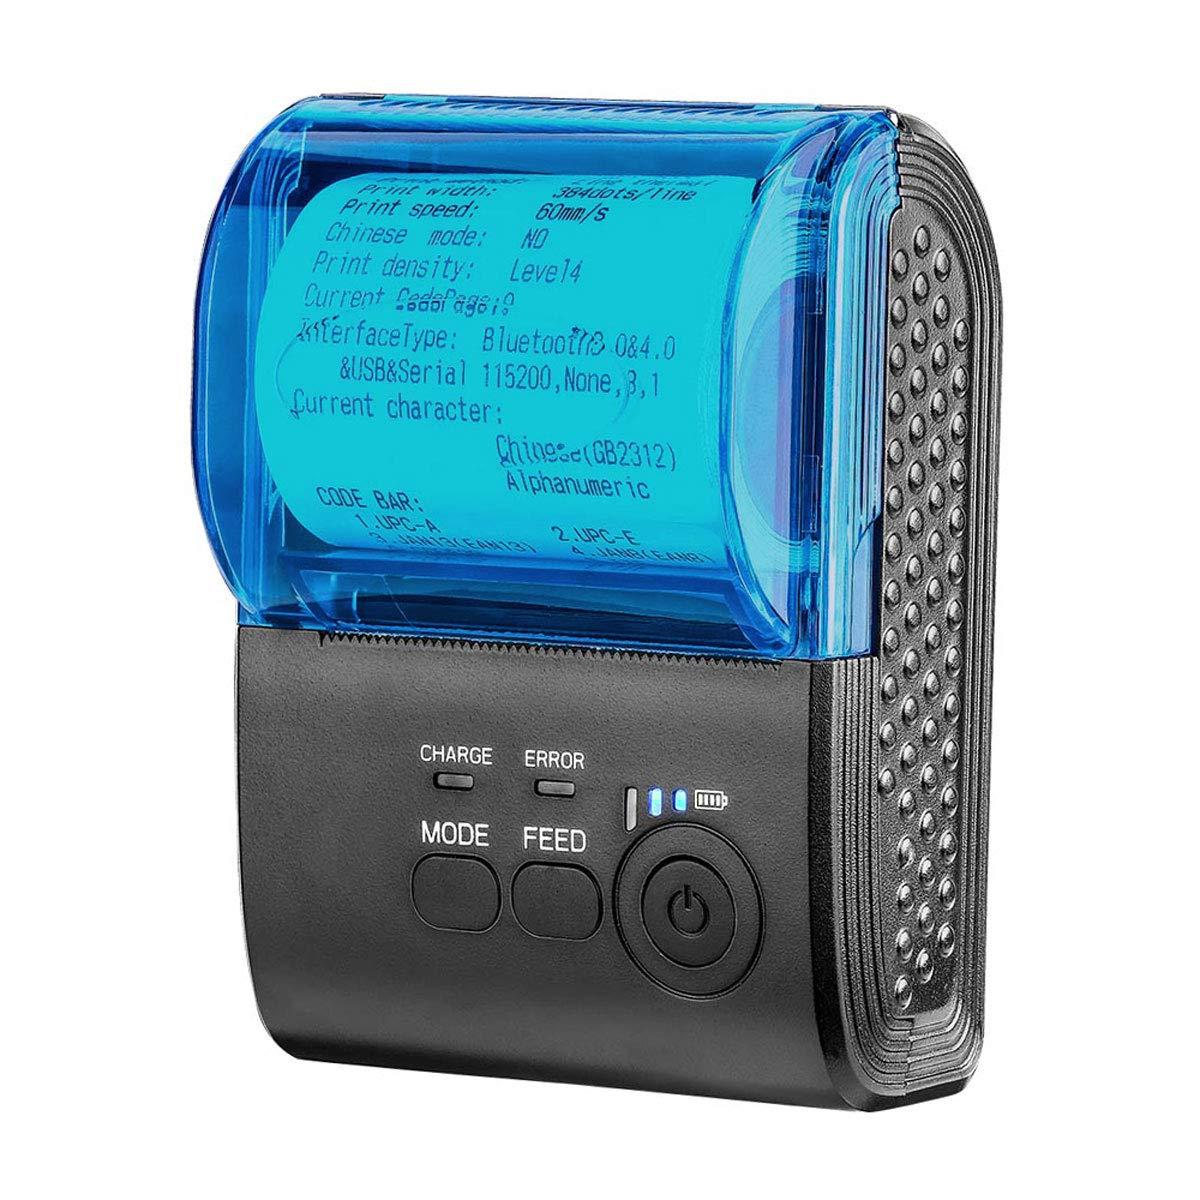 MUNBYN Impresora de Etiqueta Térmica Portáctil, Mini Tiketera de Recibos Inalámbrica Impresora de Tickets Bluetooth 4.0/ USB/COM, Comando ESC/POS ...